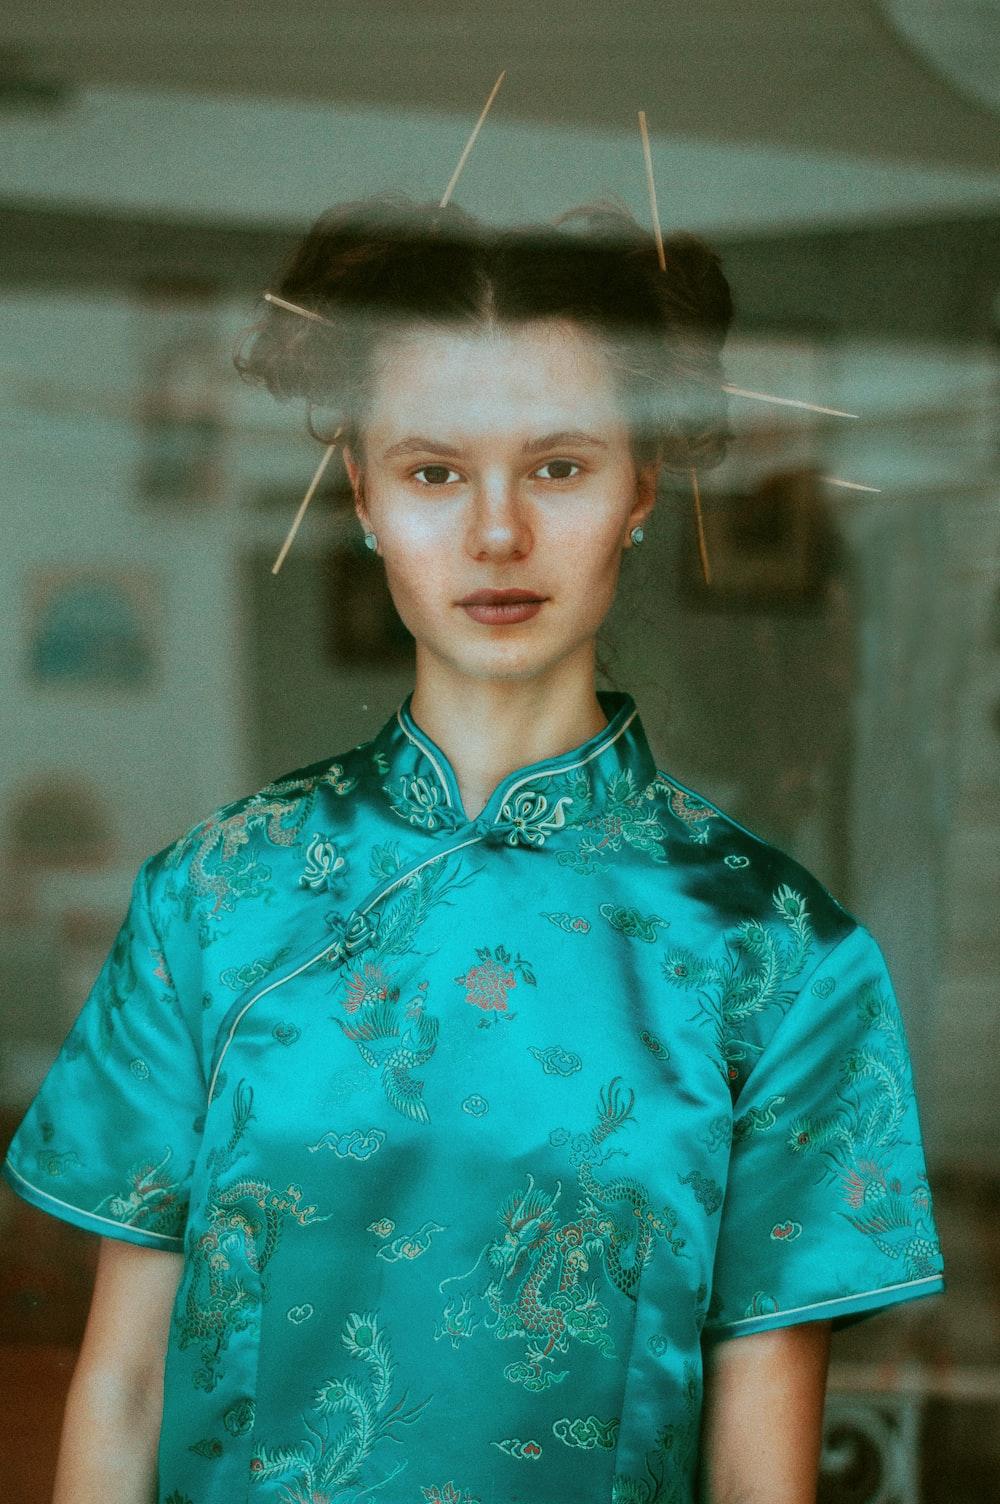 woman wearing green short-sleeved top inside room